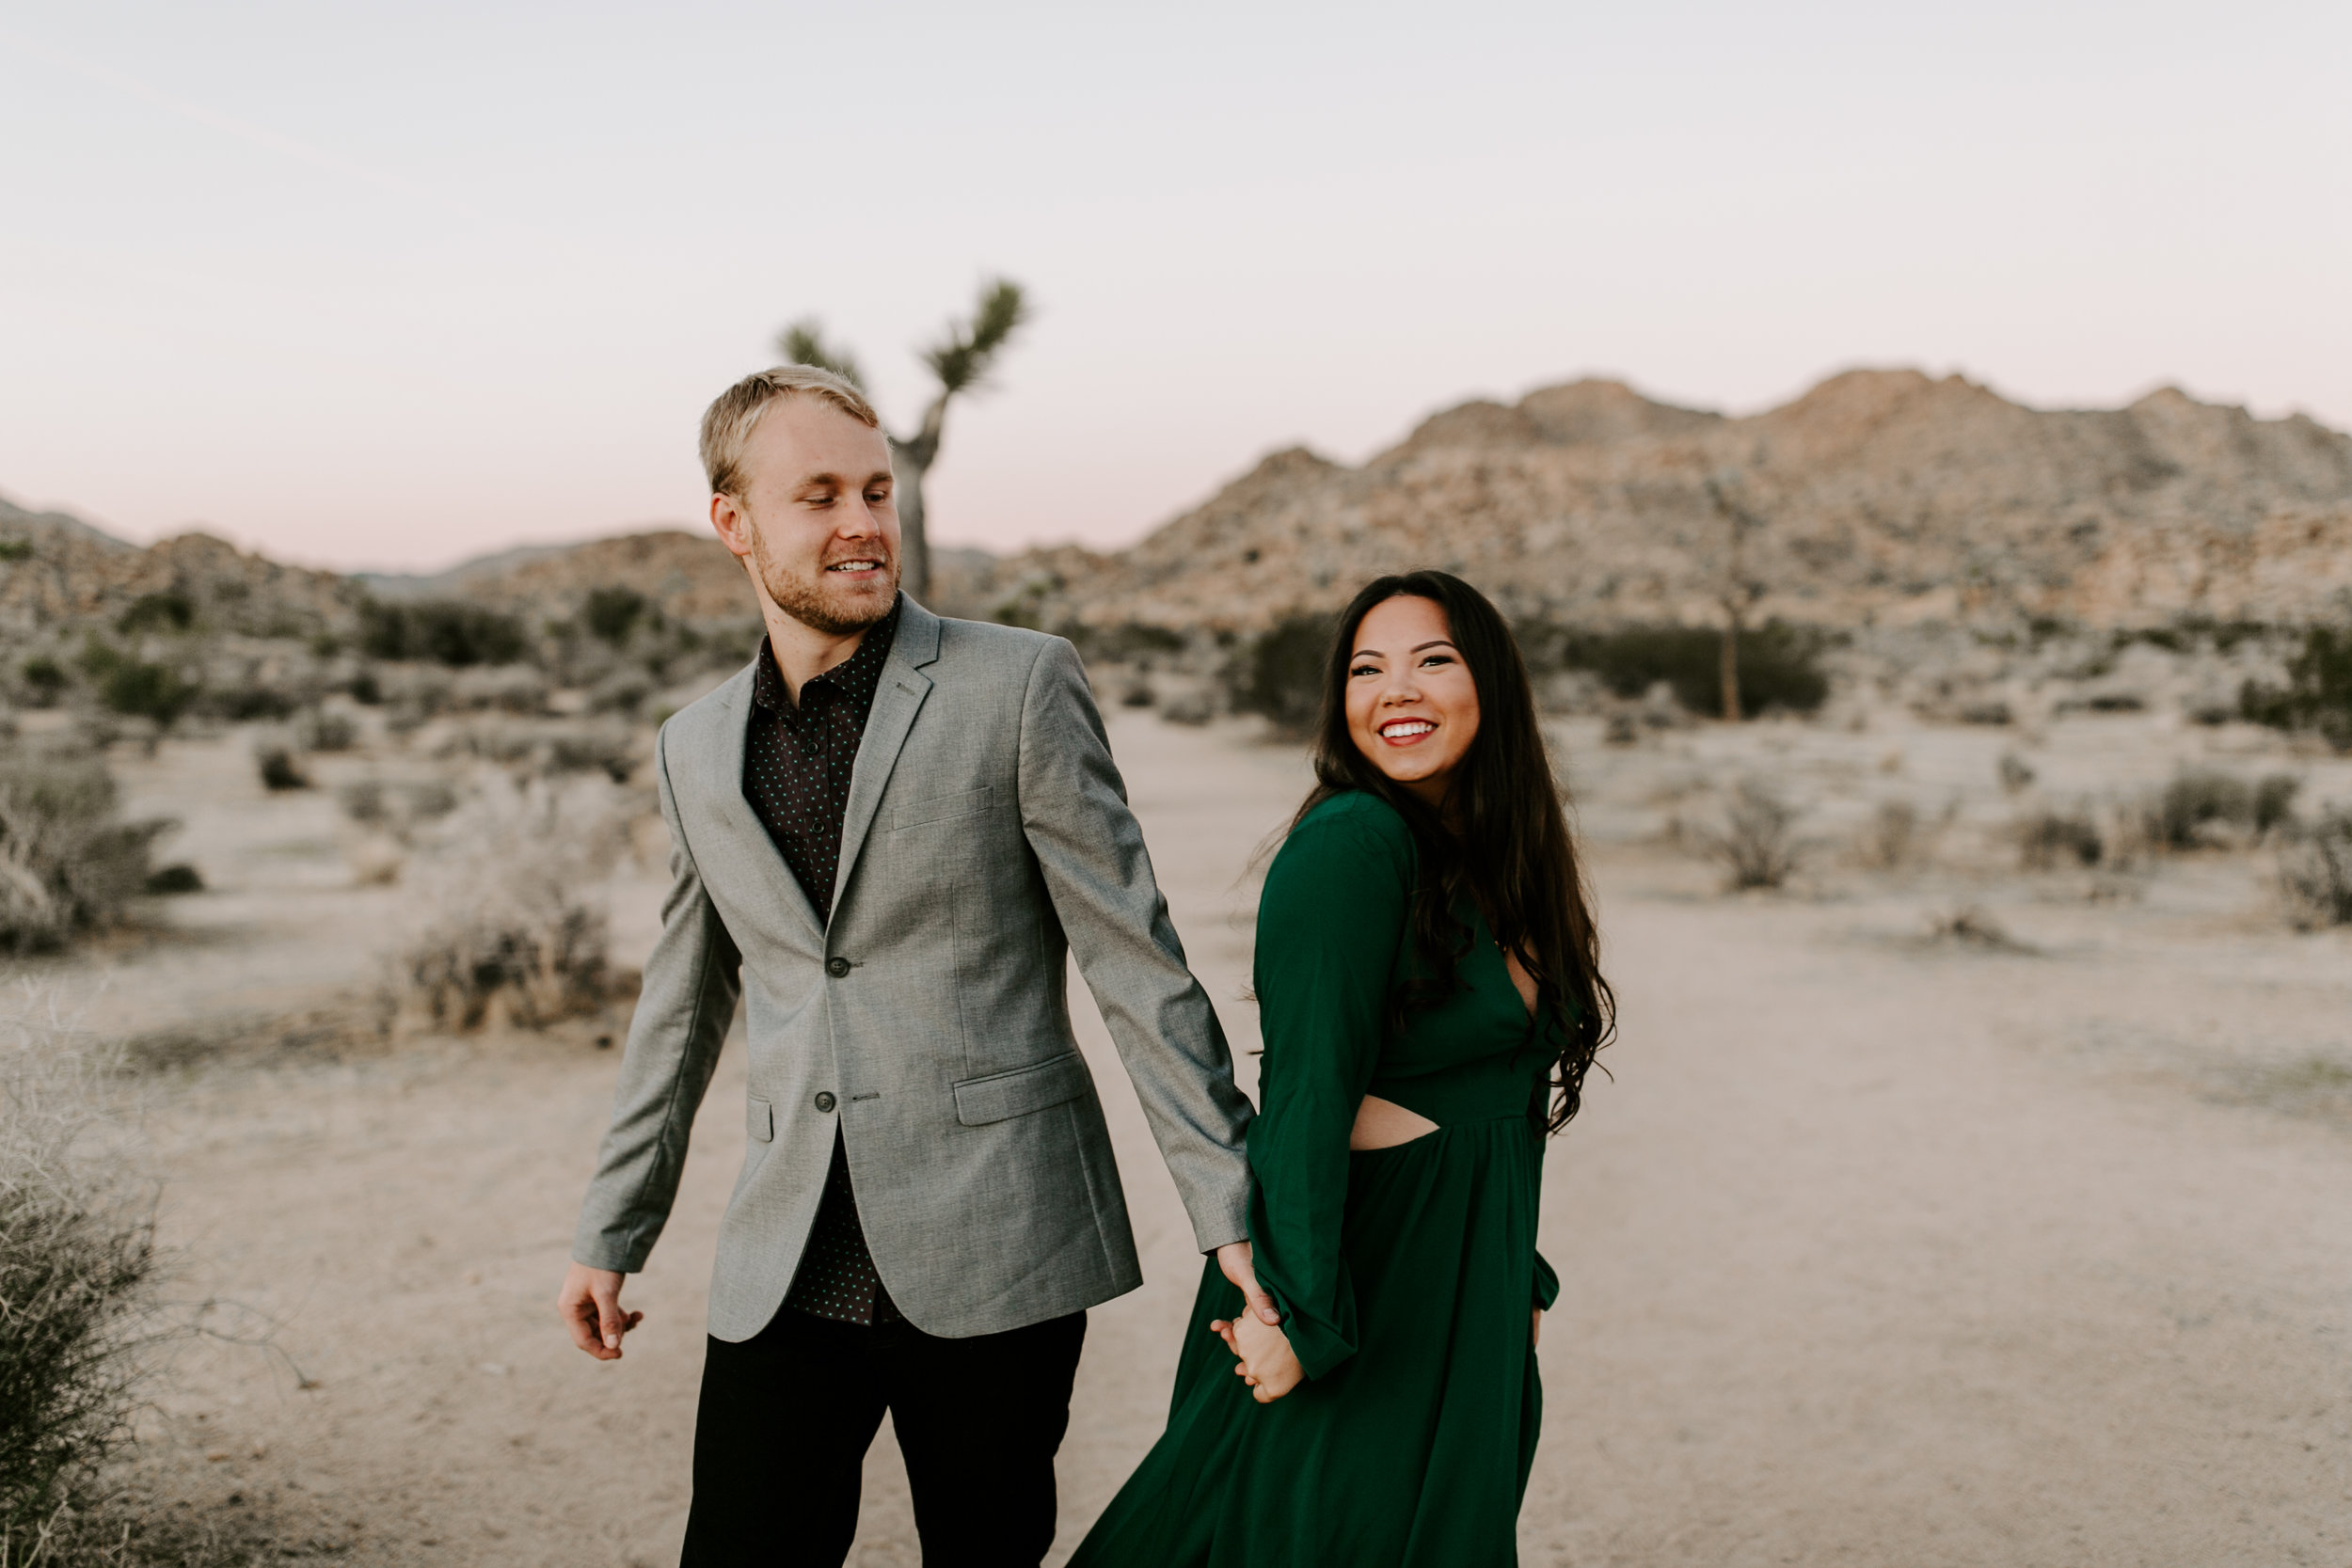 joshua-tree-elopement-photographer-california-wedding-photographer-4.jpg